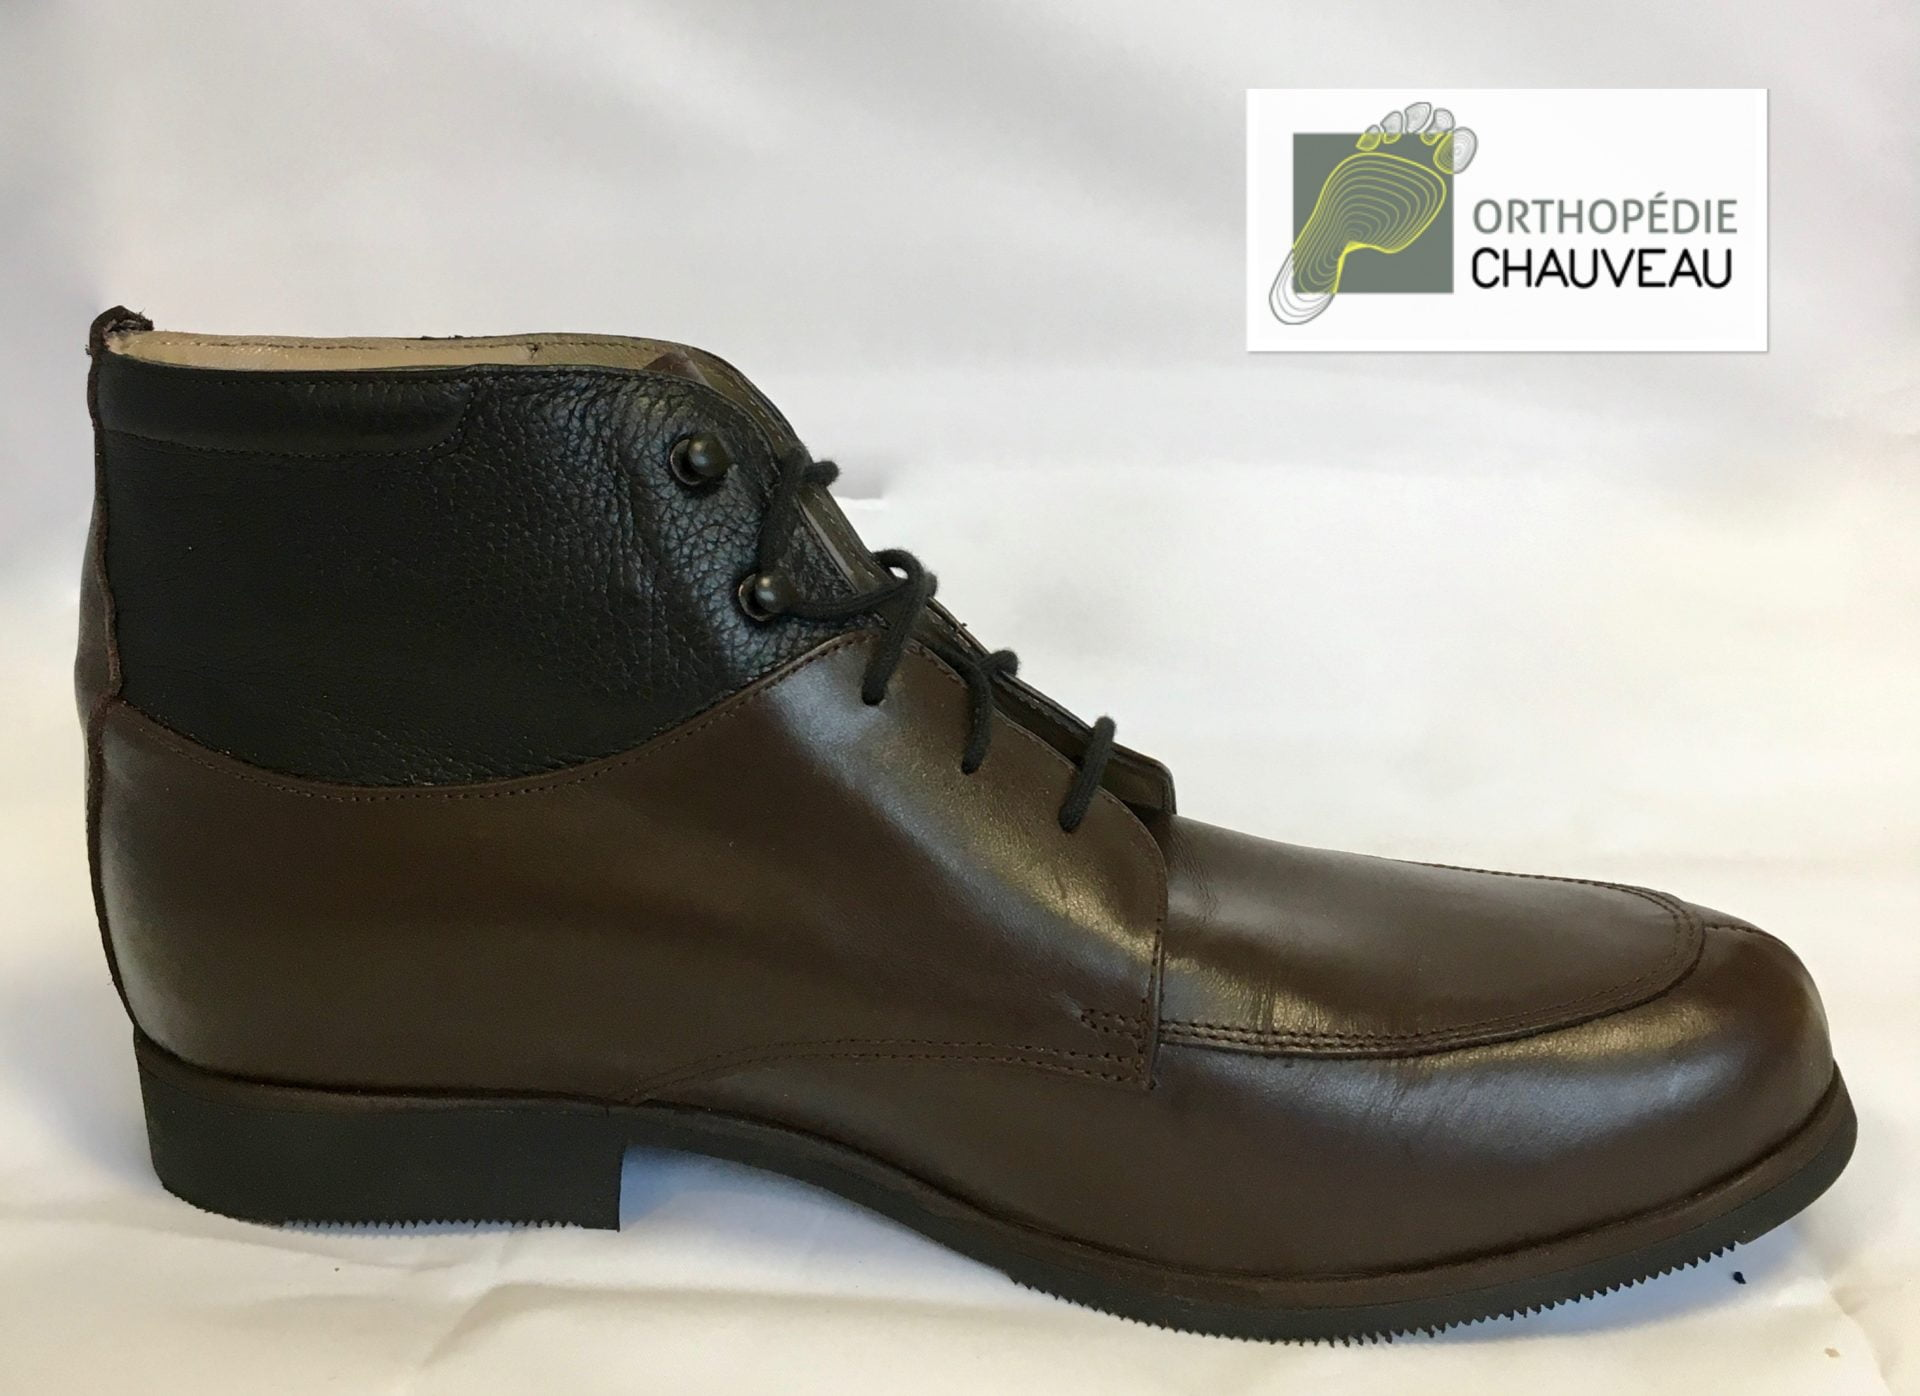 chaussures orthopediques Rennes bottine bicolore